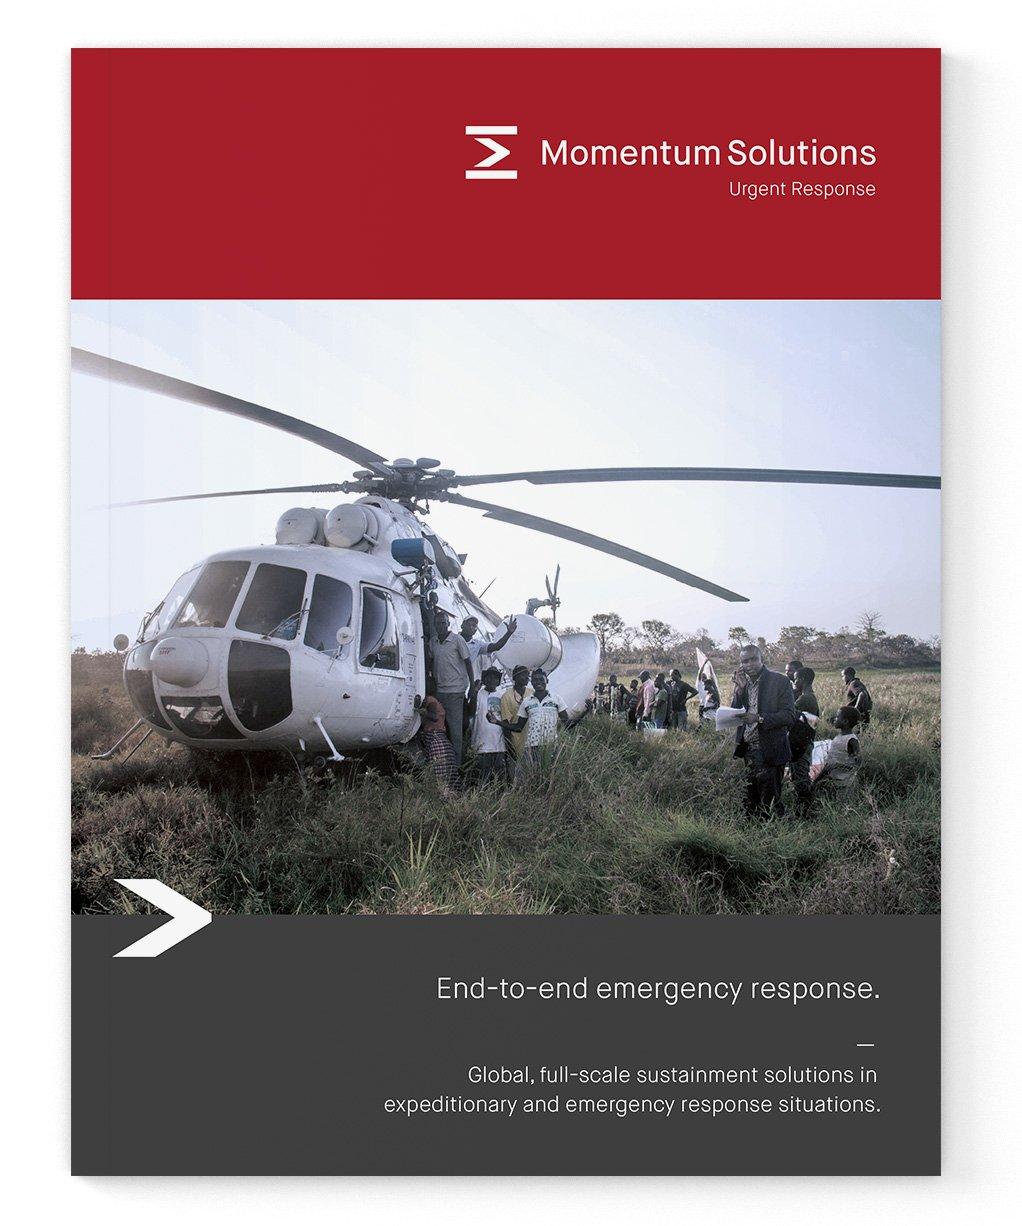 Urgent response branding booklet design